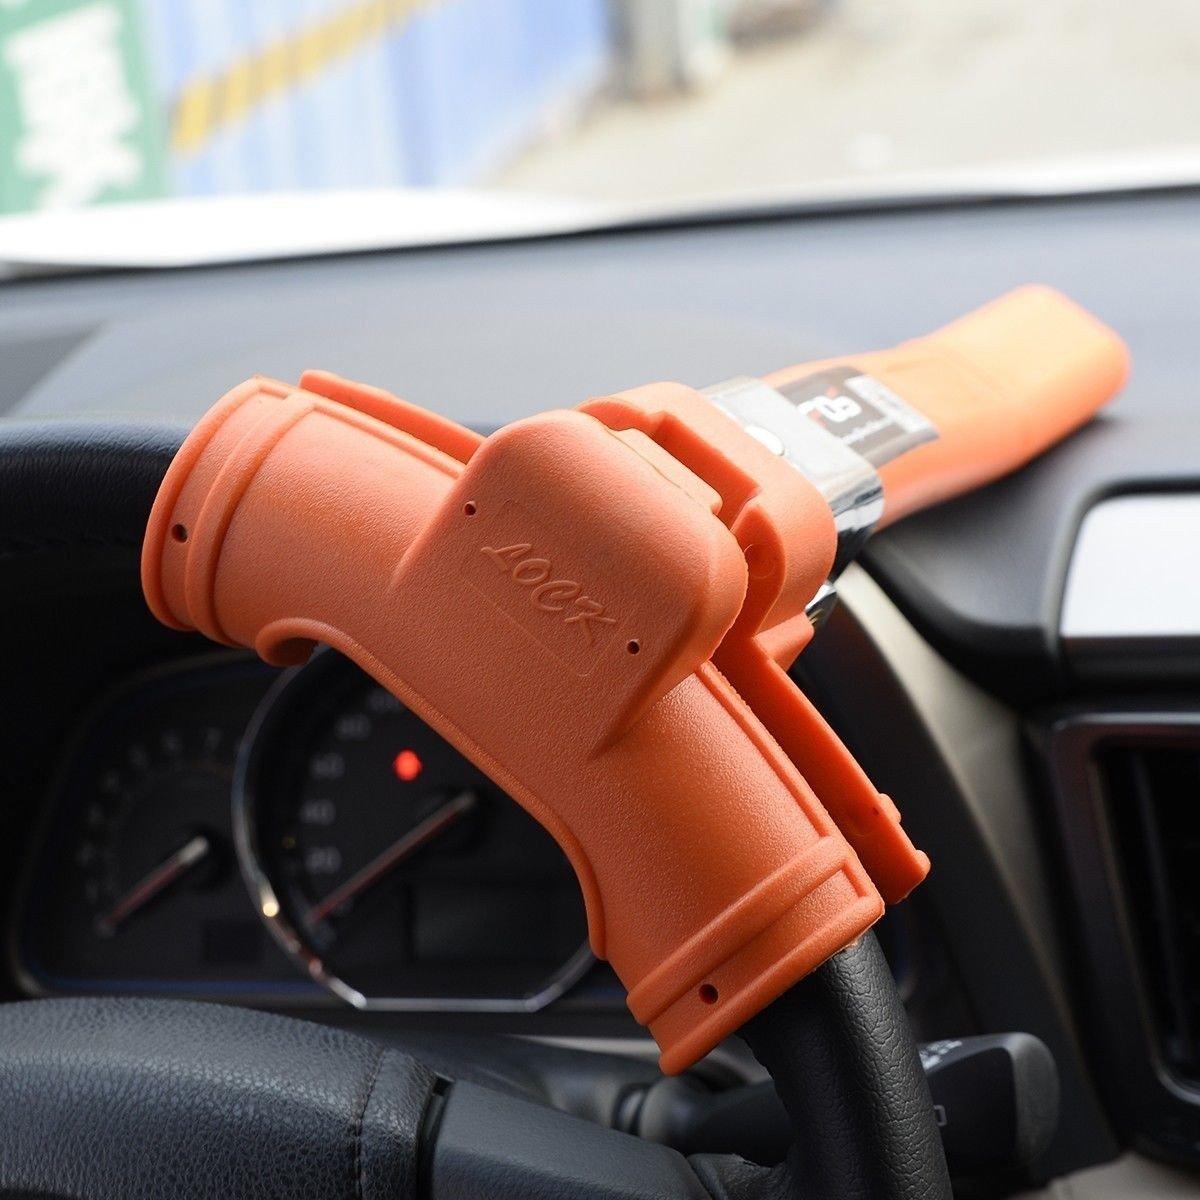 Steering Wheel Lock Vehicle Car Security Keyed Lock Anti Theft New by Apontus (Image #4)